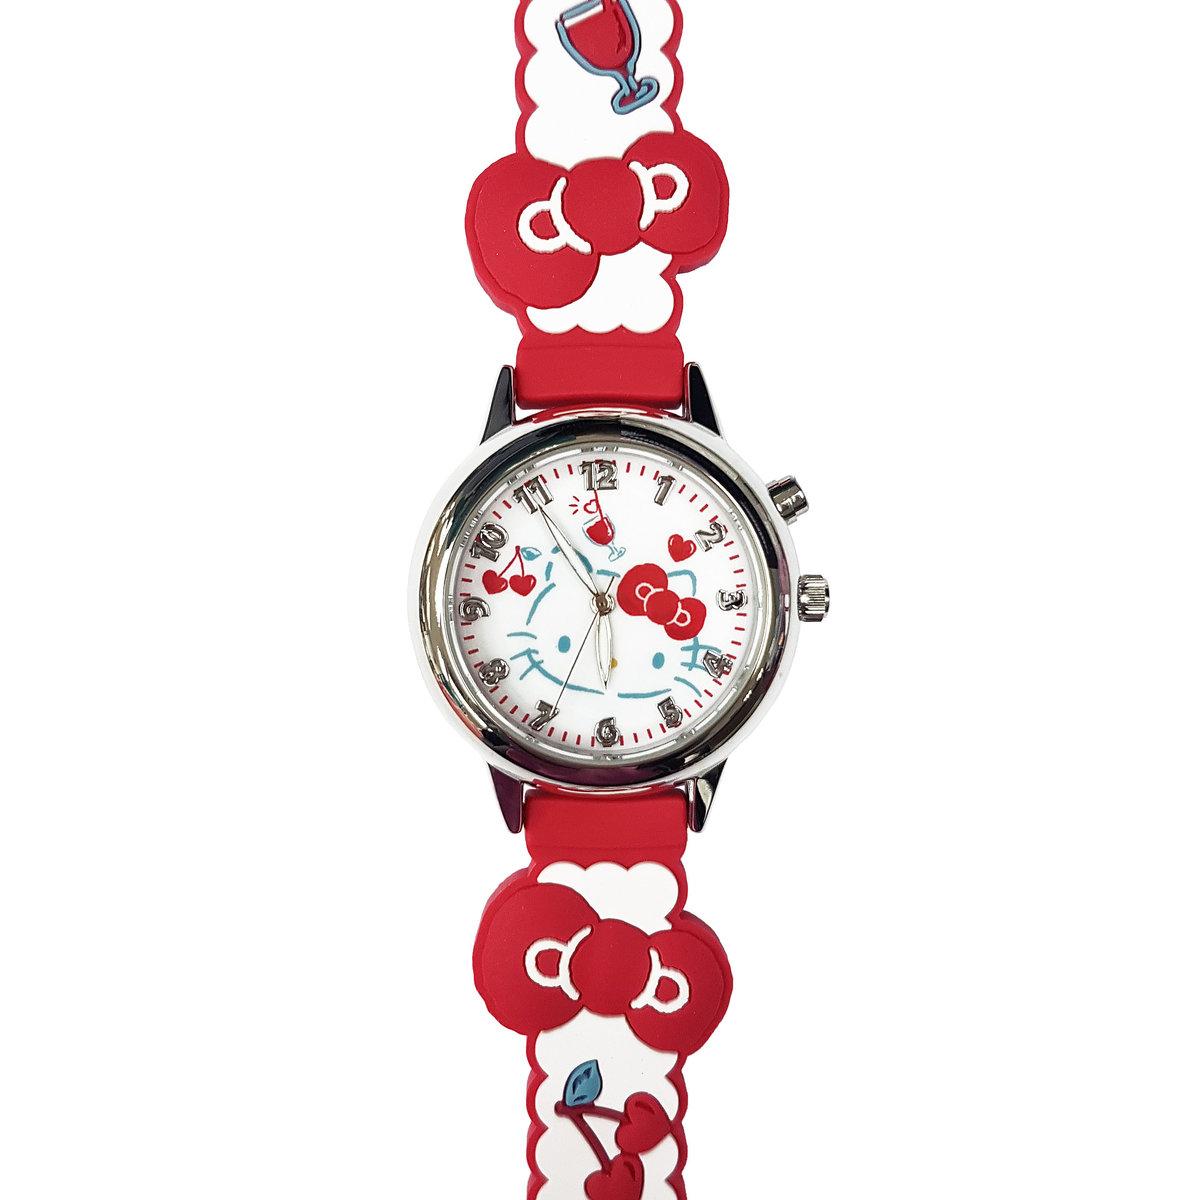 SANRIO - Hello Kitty light up quartz watch (Red)